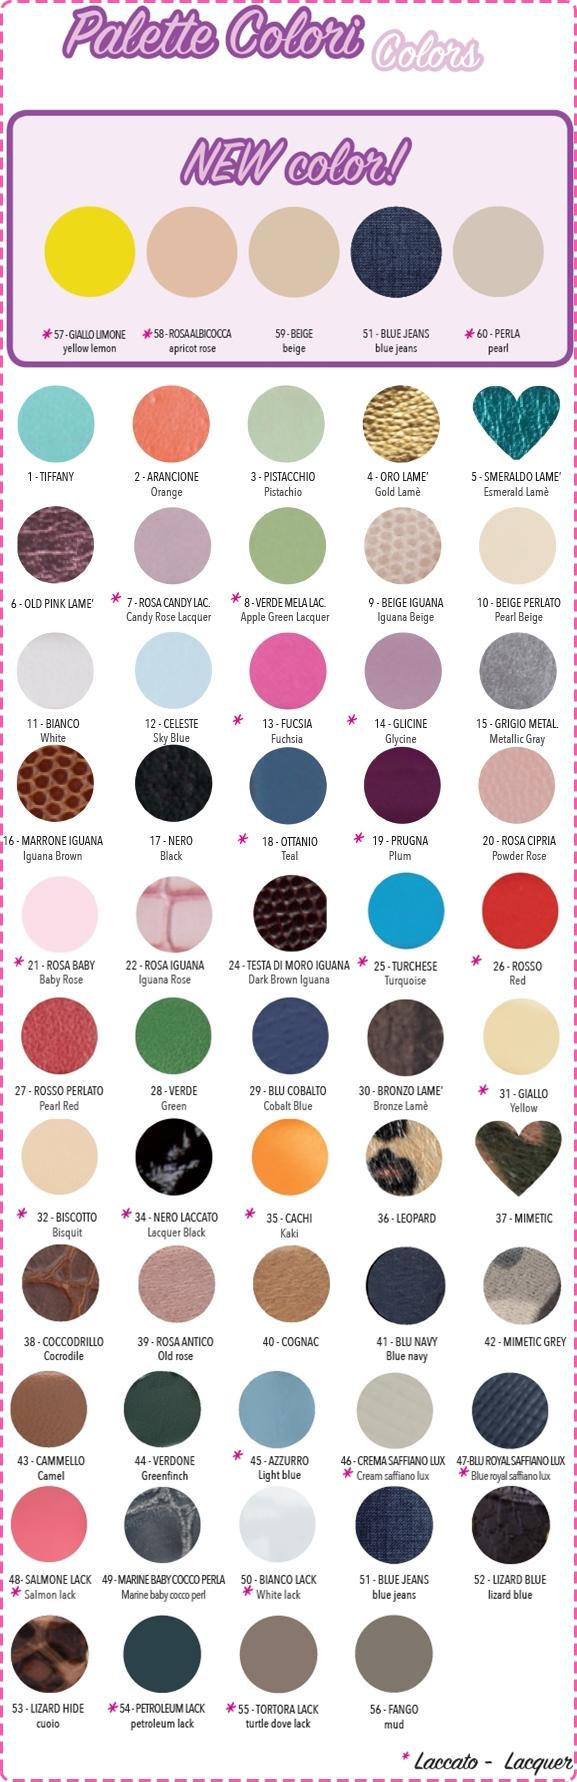 colori%20charlottes%202018.jpg